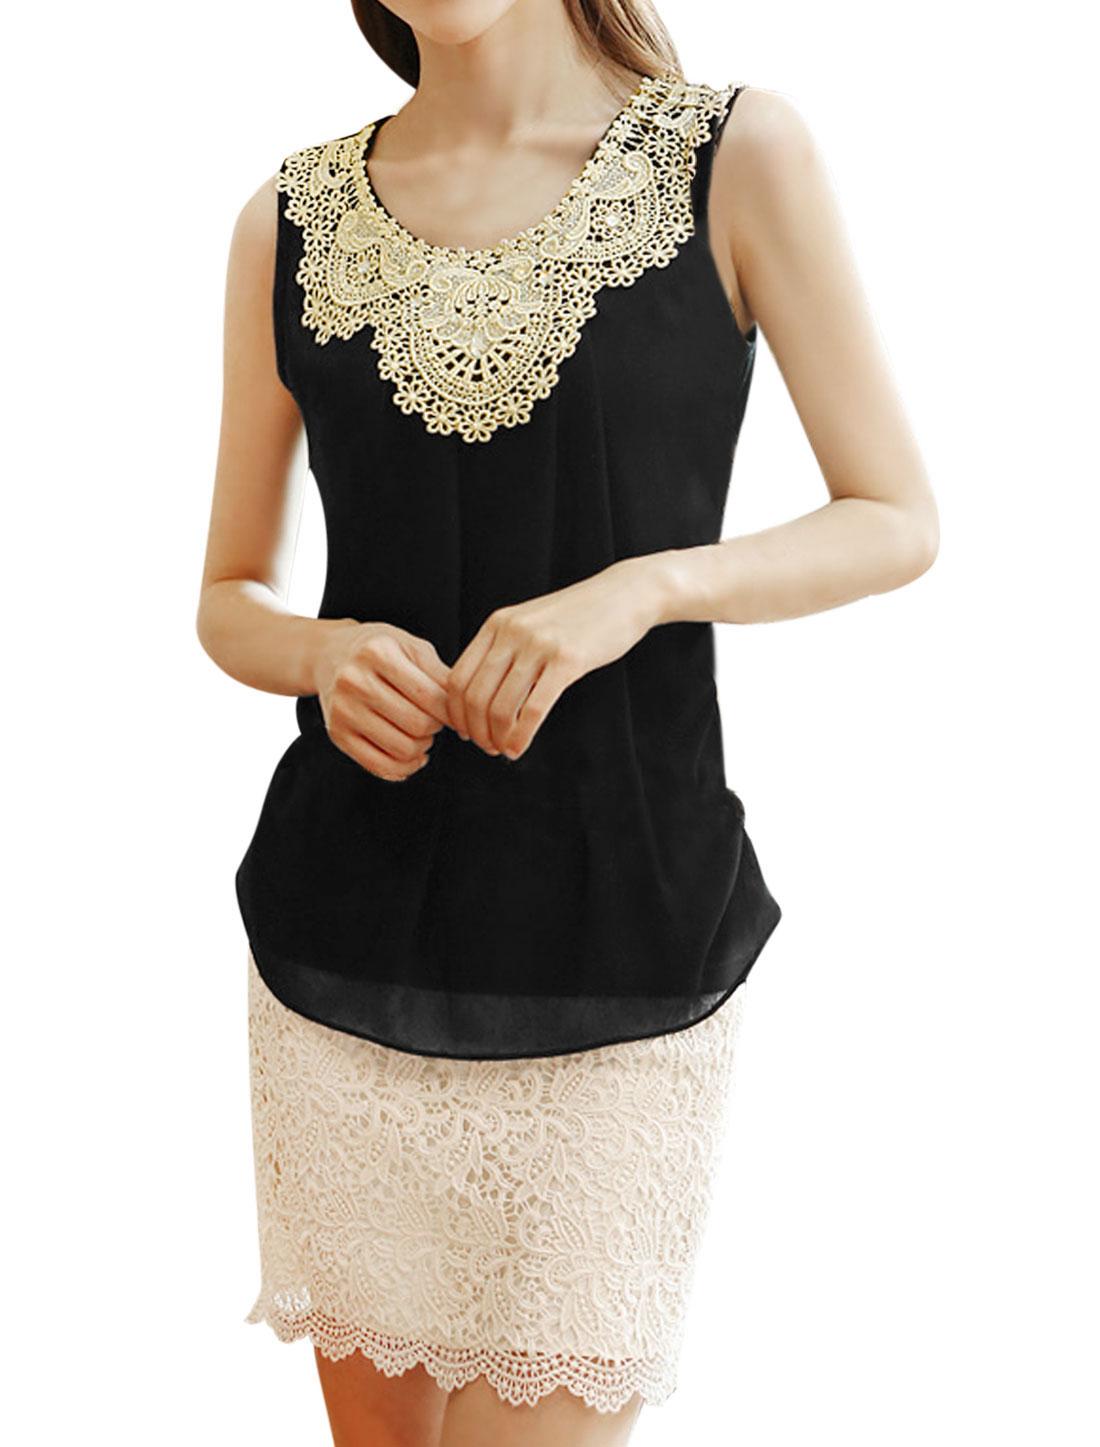 Ladies Round Neck Sleeveless Crochet Embroidery Casual Shirt Black M